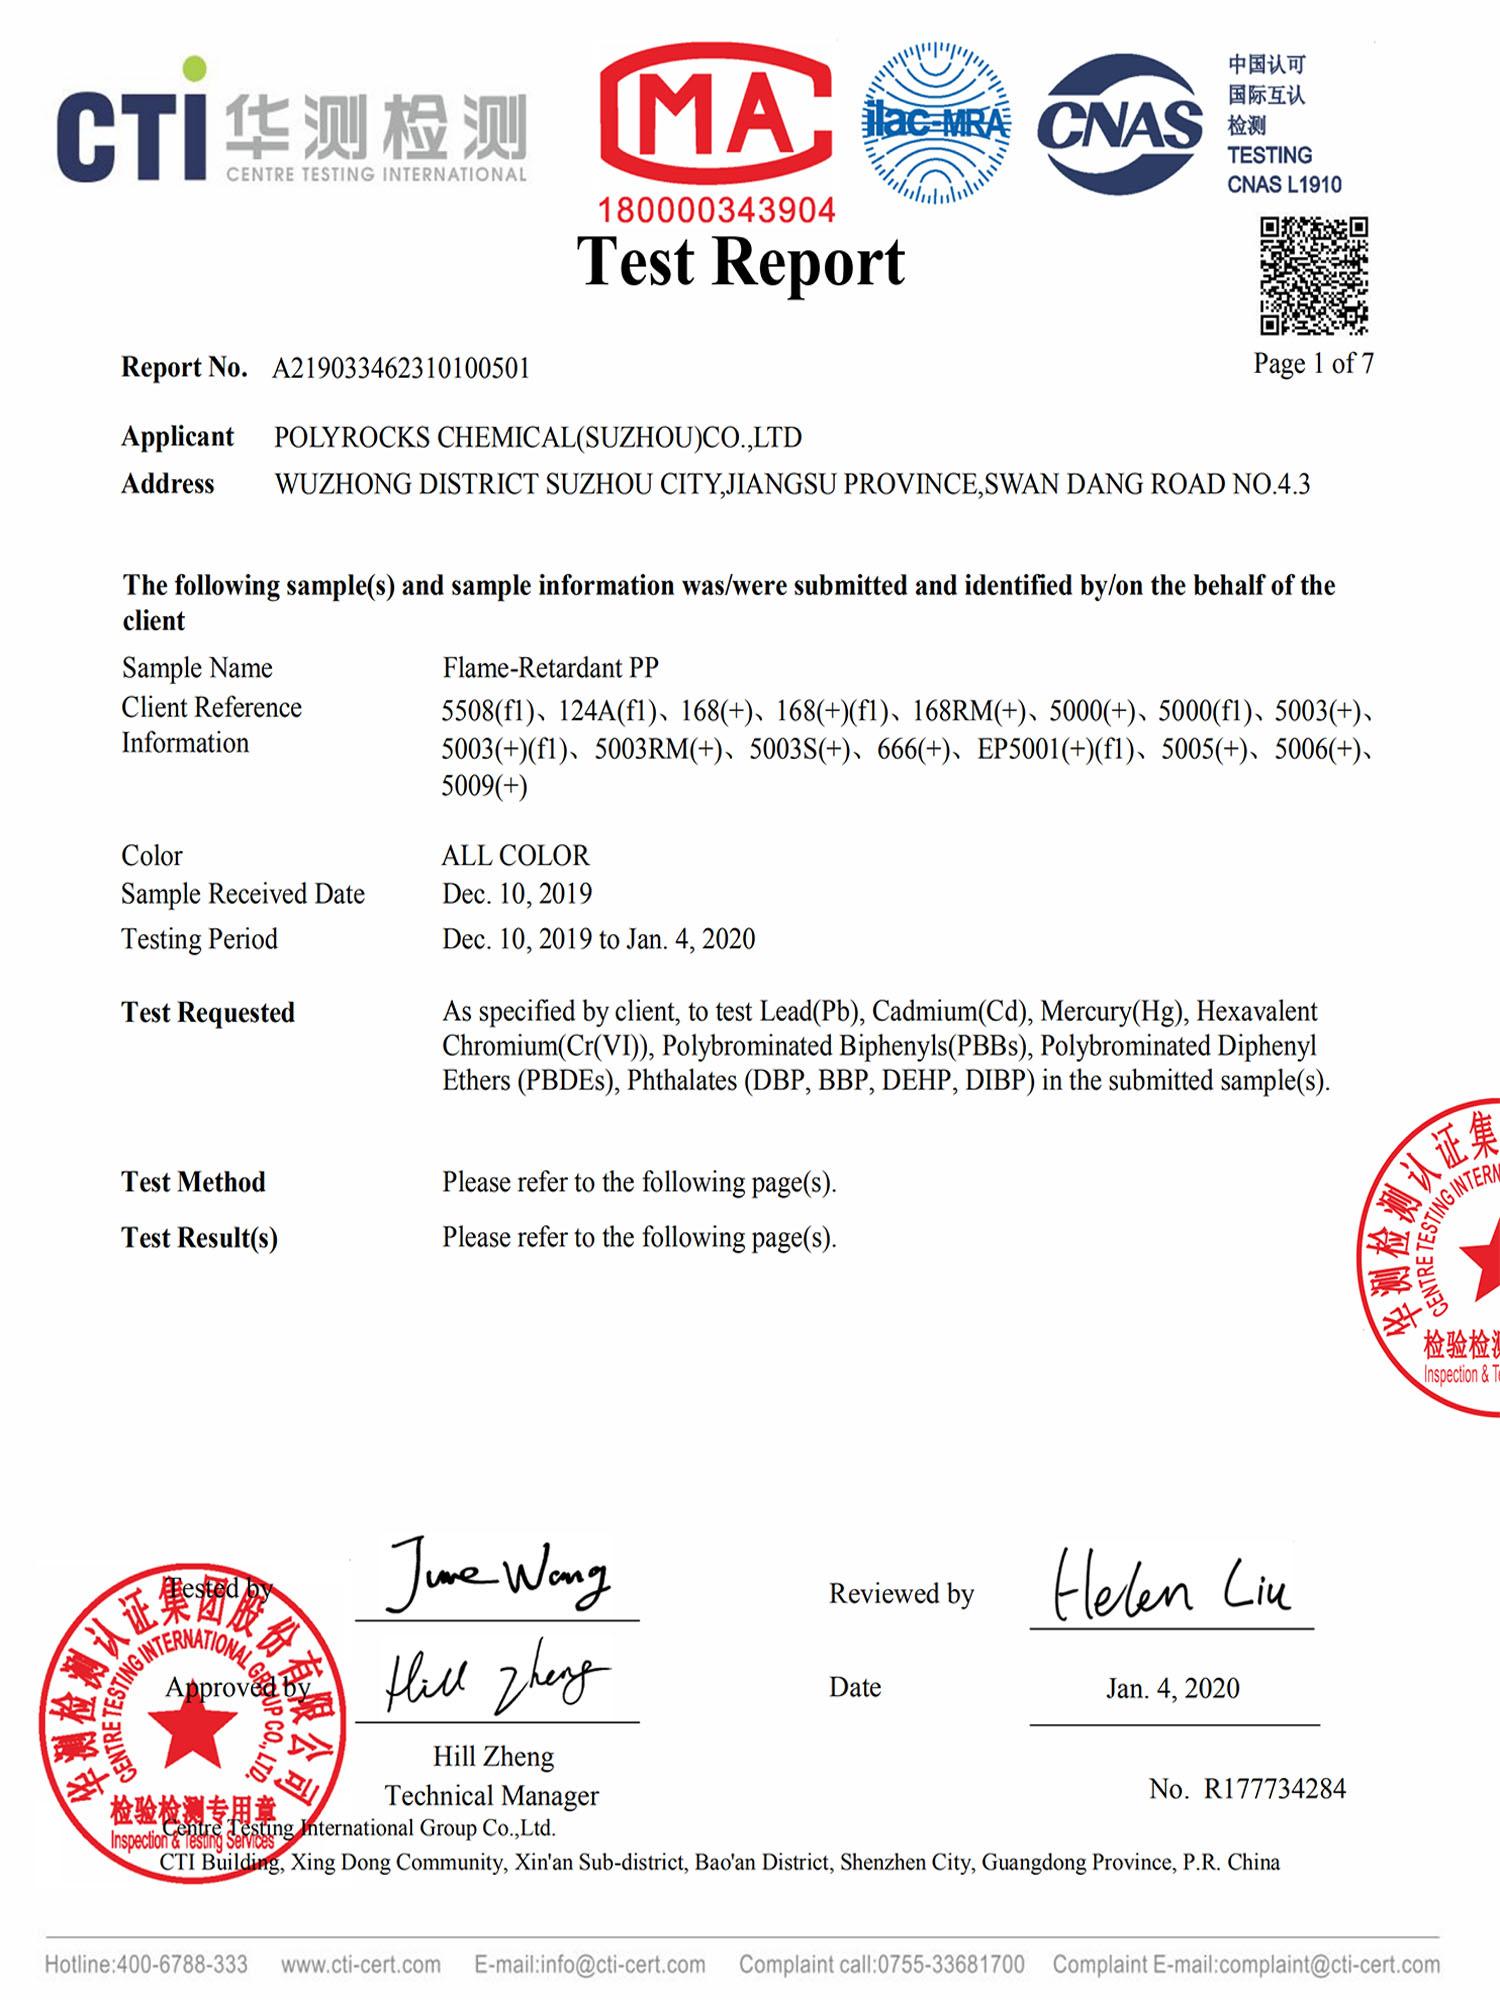 RoHs认证-5003(+)